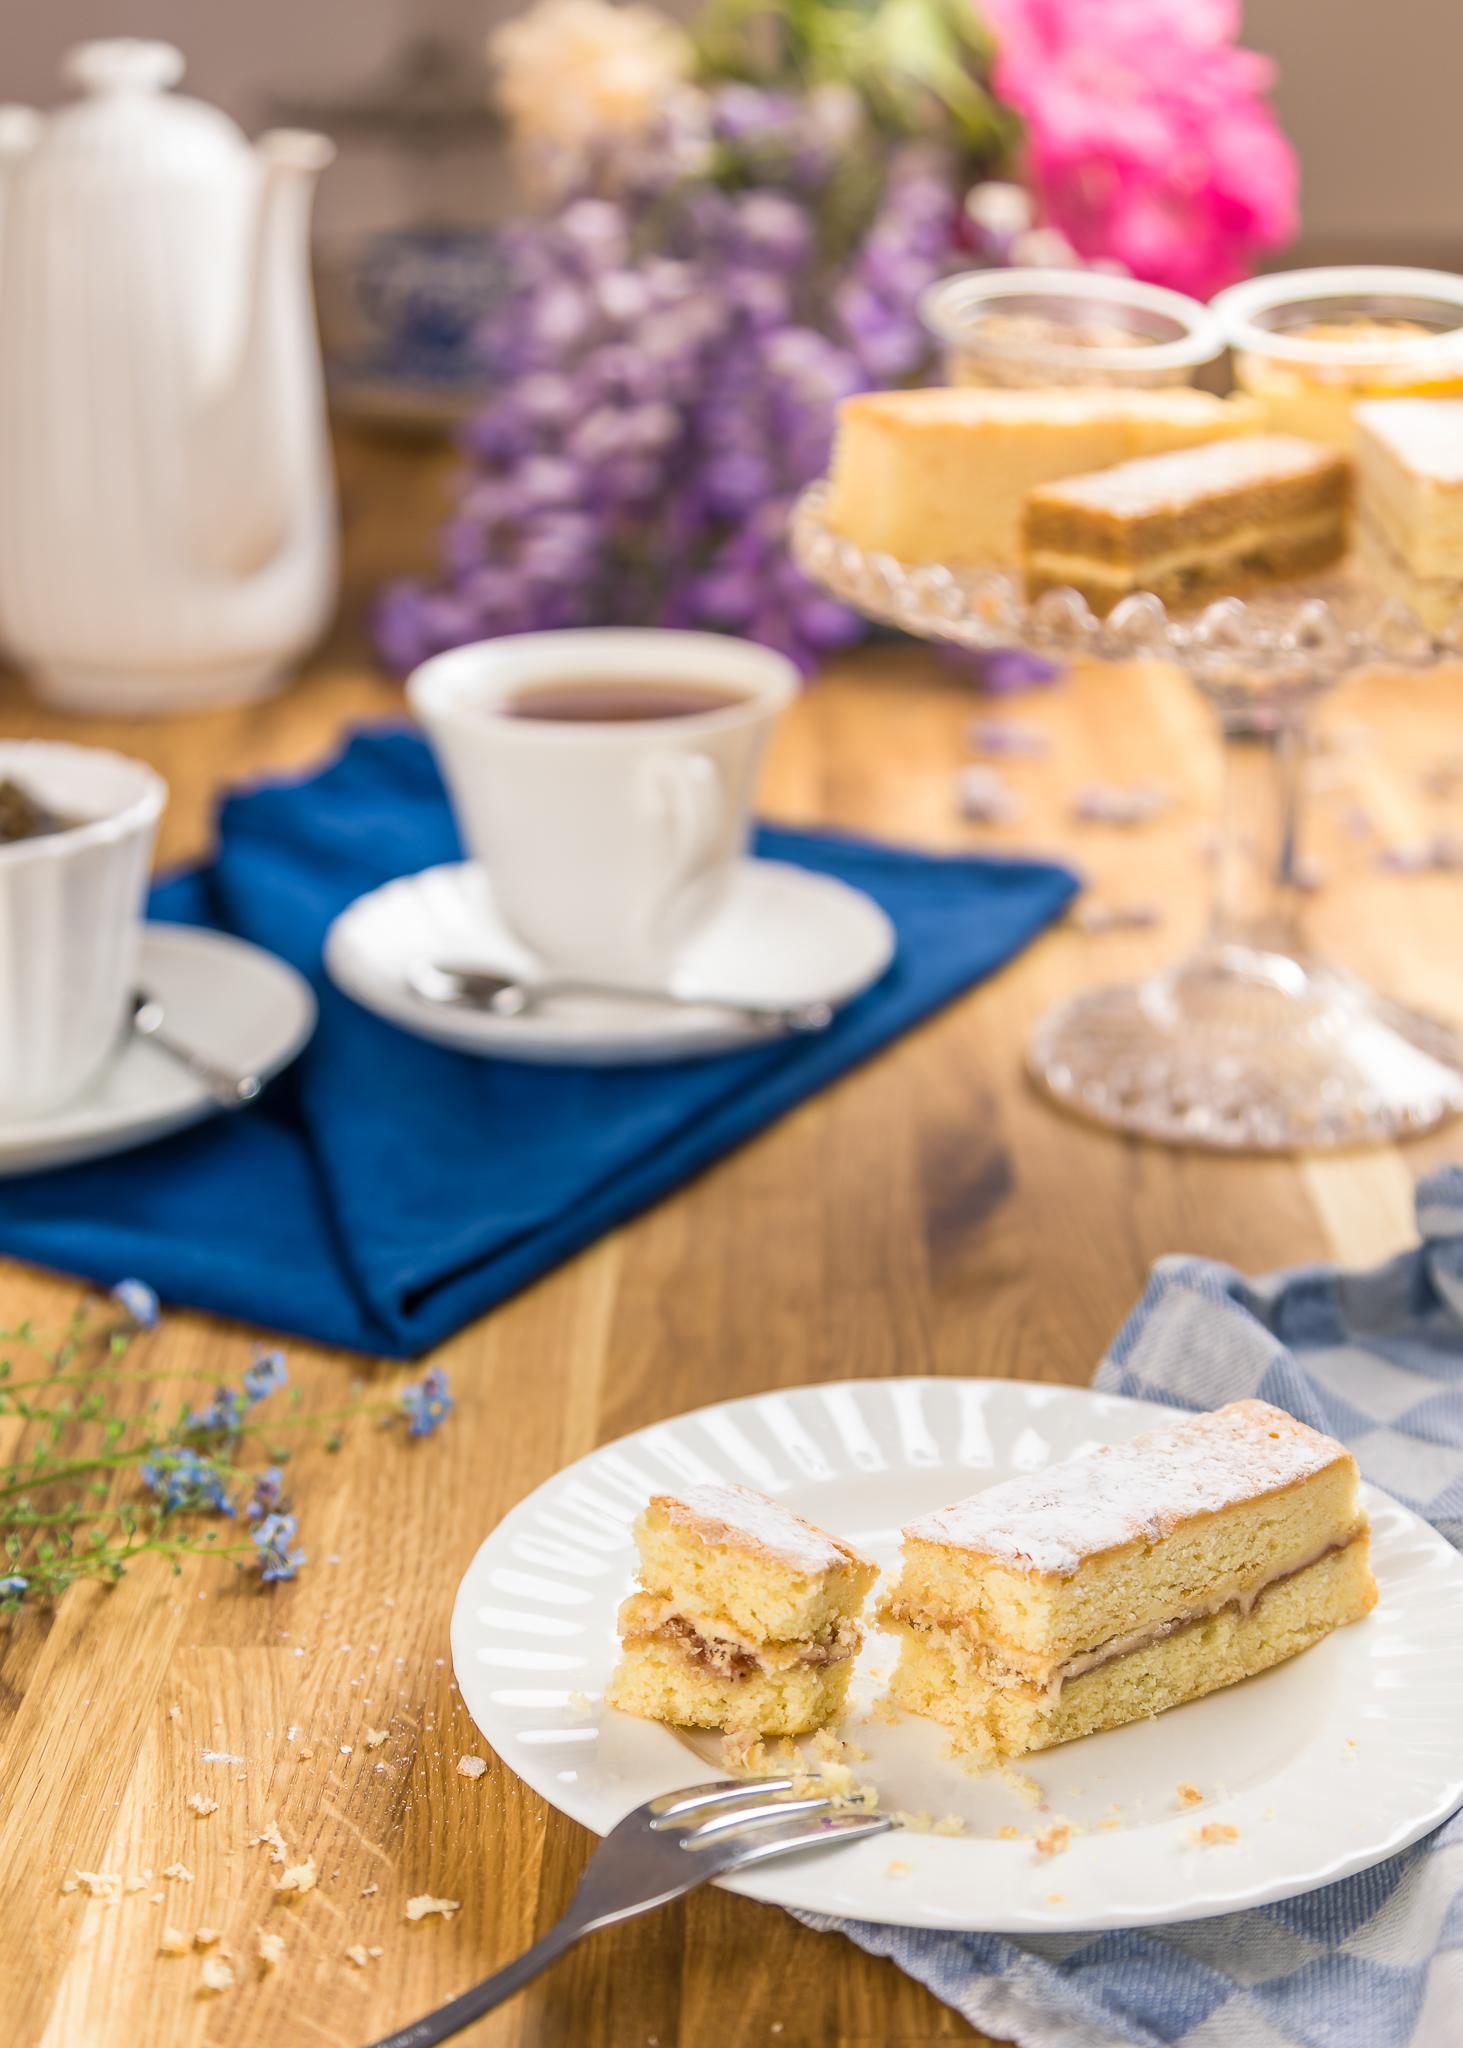 GASTRO-SWEETS - Deli-Cakes-WEB-2048px@72ppi-sRGB.jpg